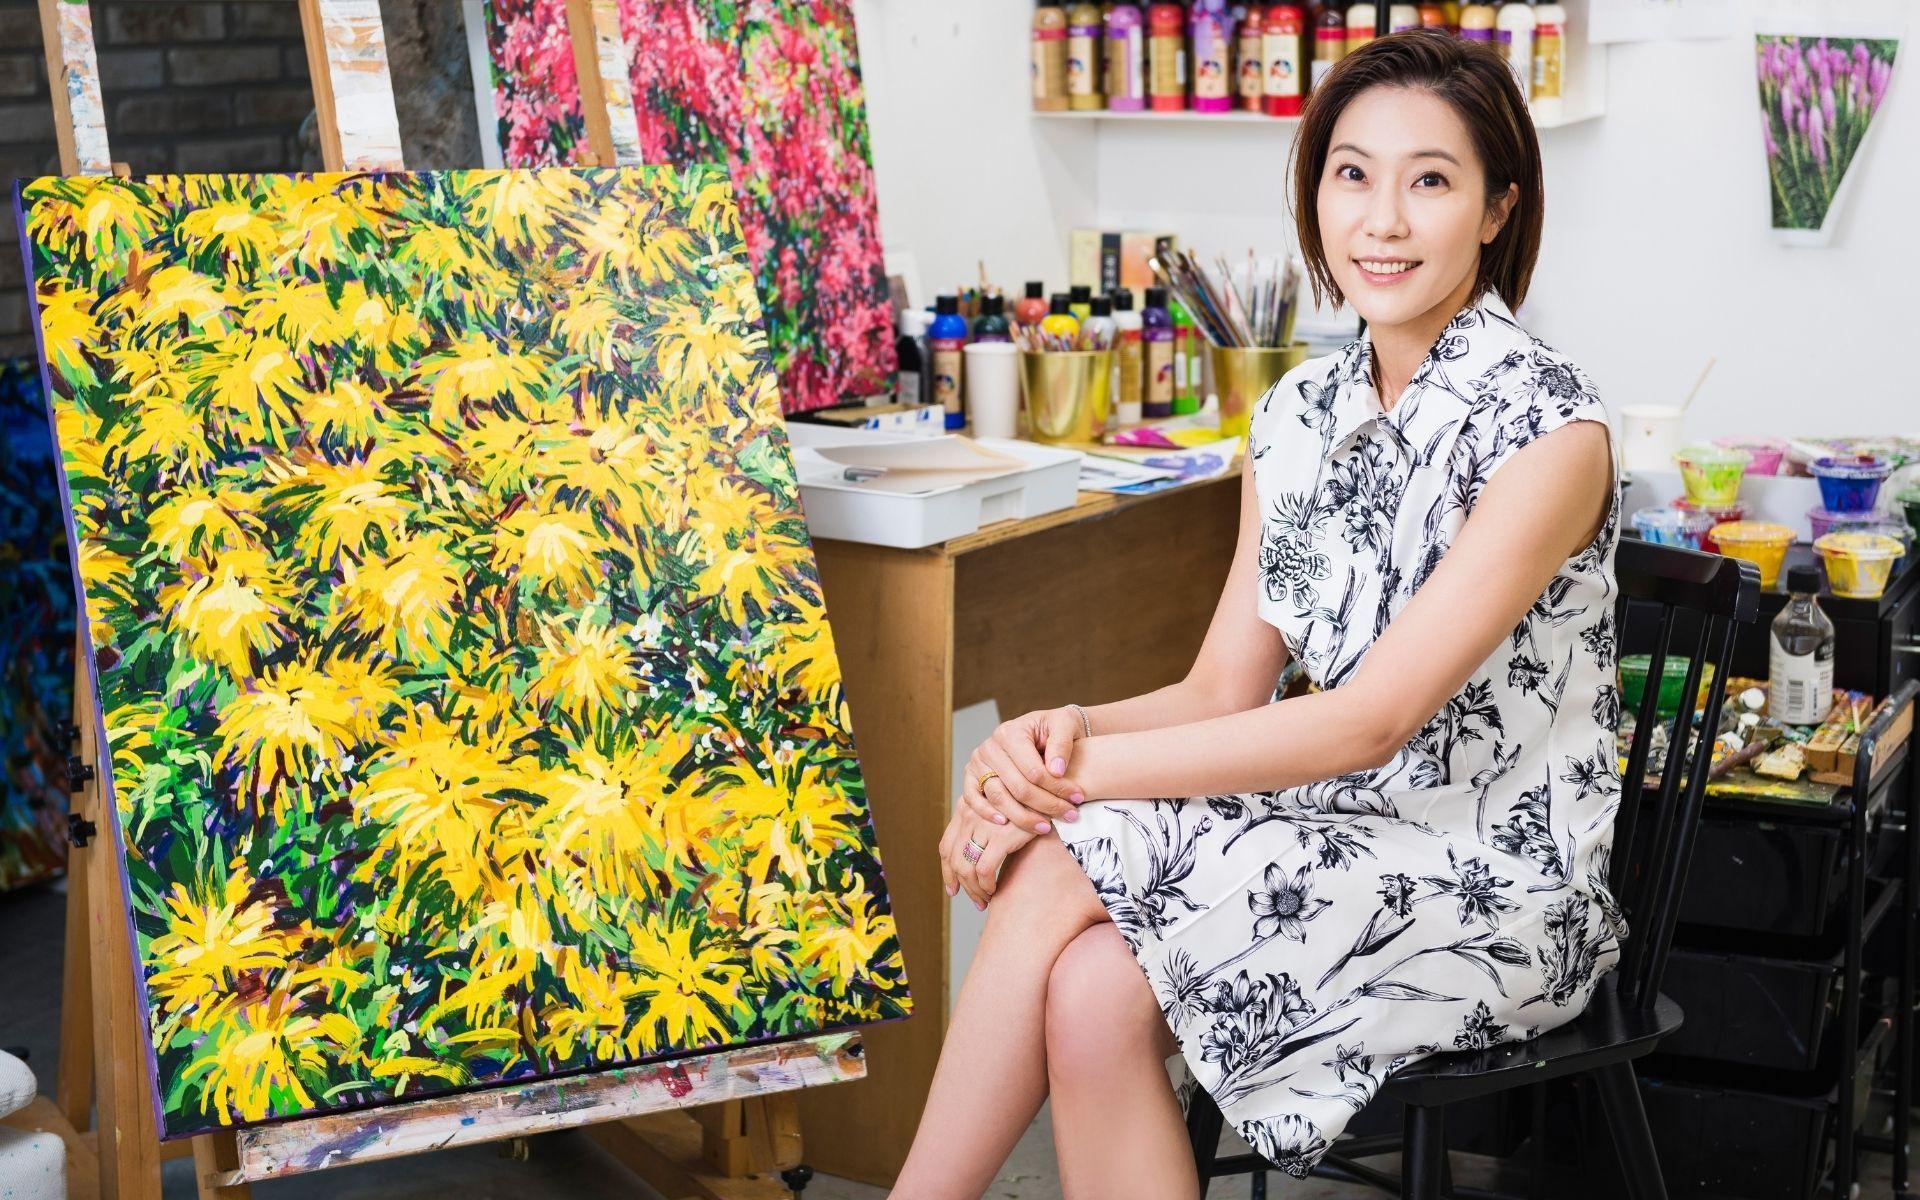 Salvatore Ferragamo Partners With Korean Artist Boree Hur On Tuscan Wildflowers Campaign